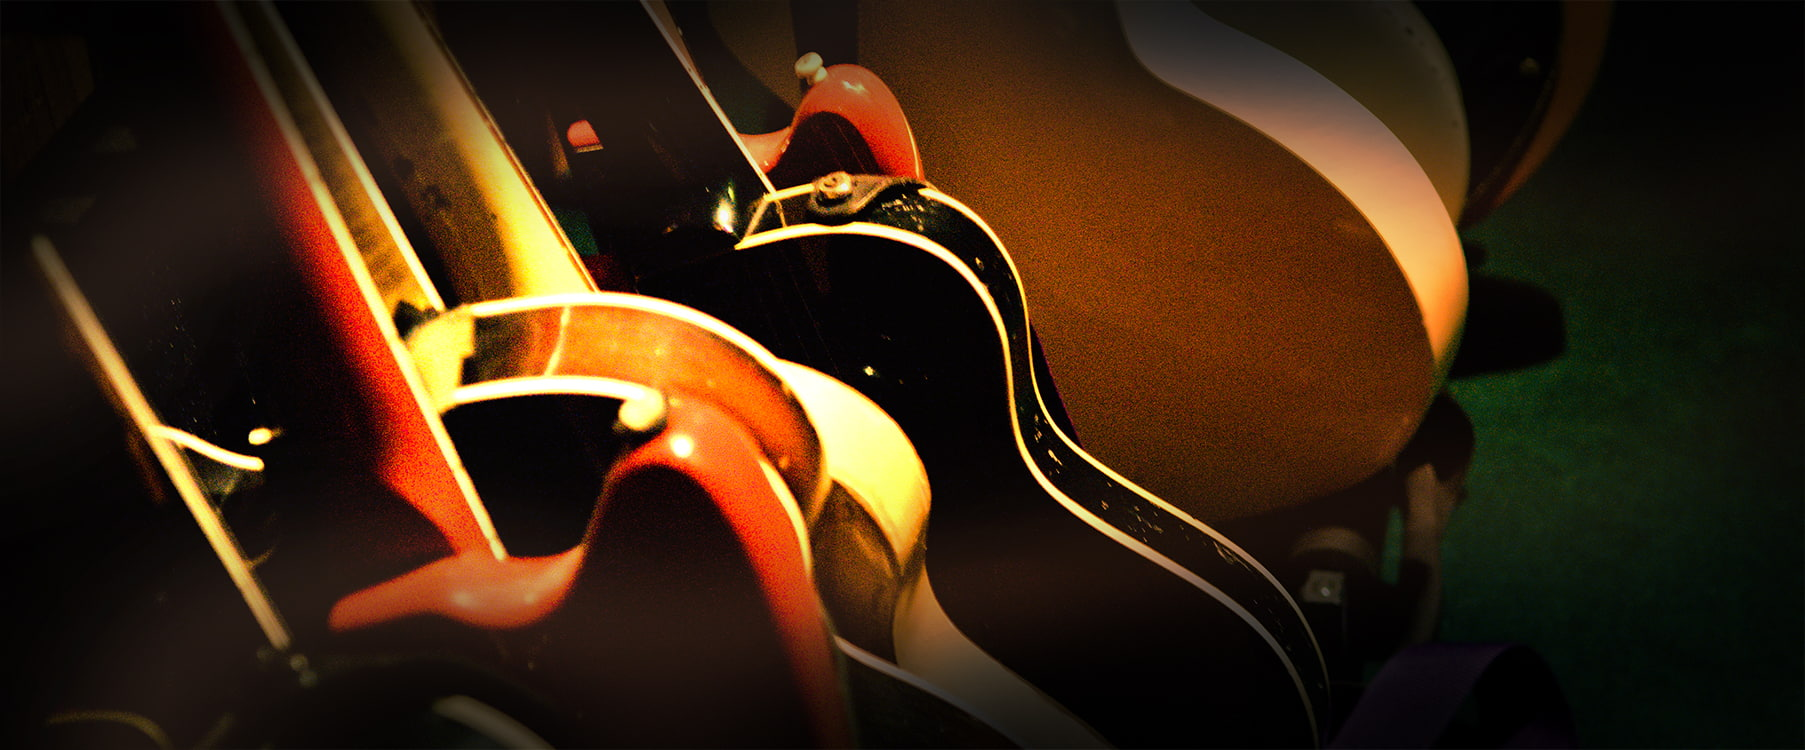 Layering Guitars for Maximum Impact